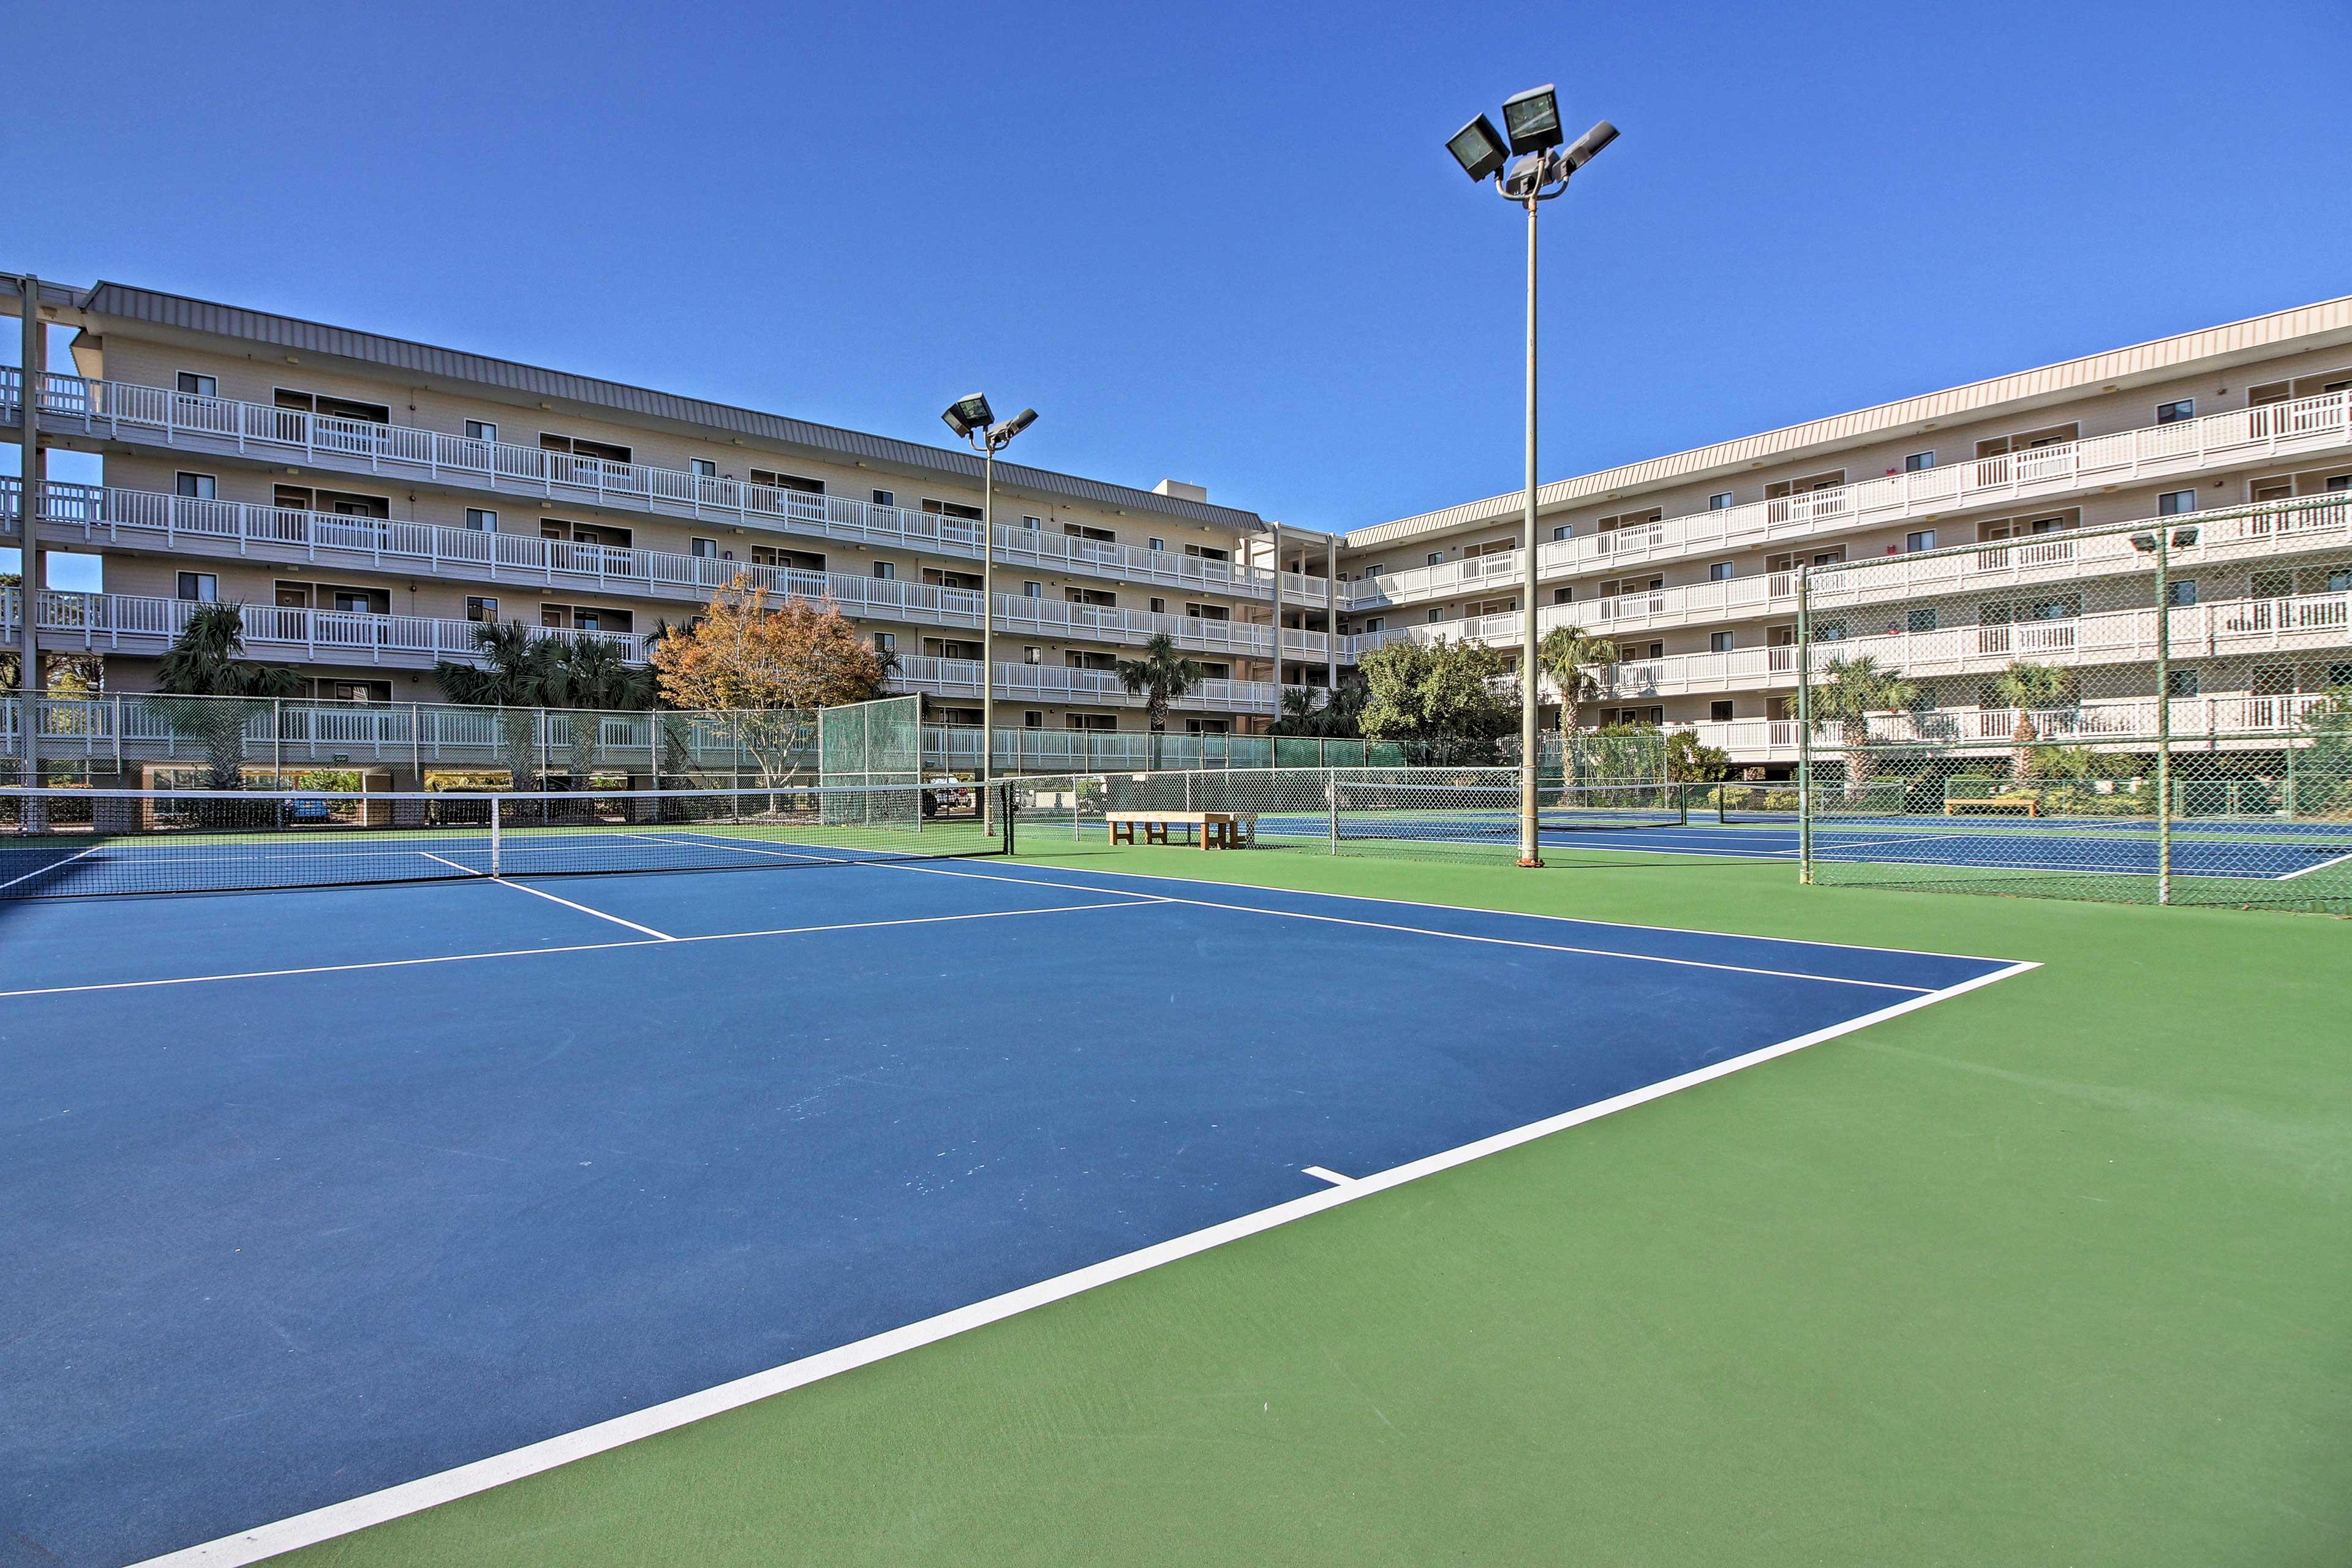 Play a few tennis matches!